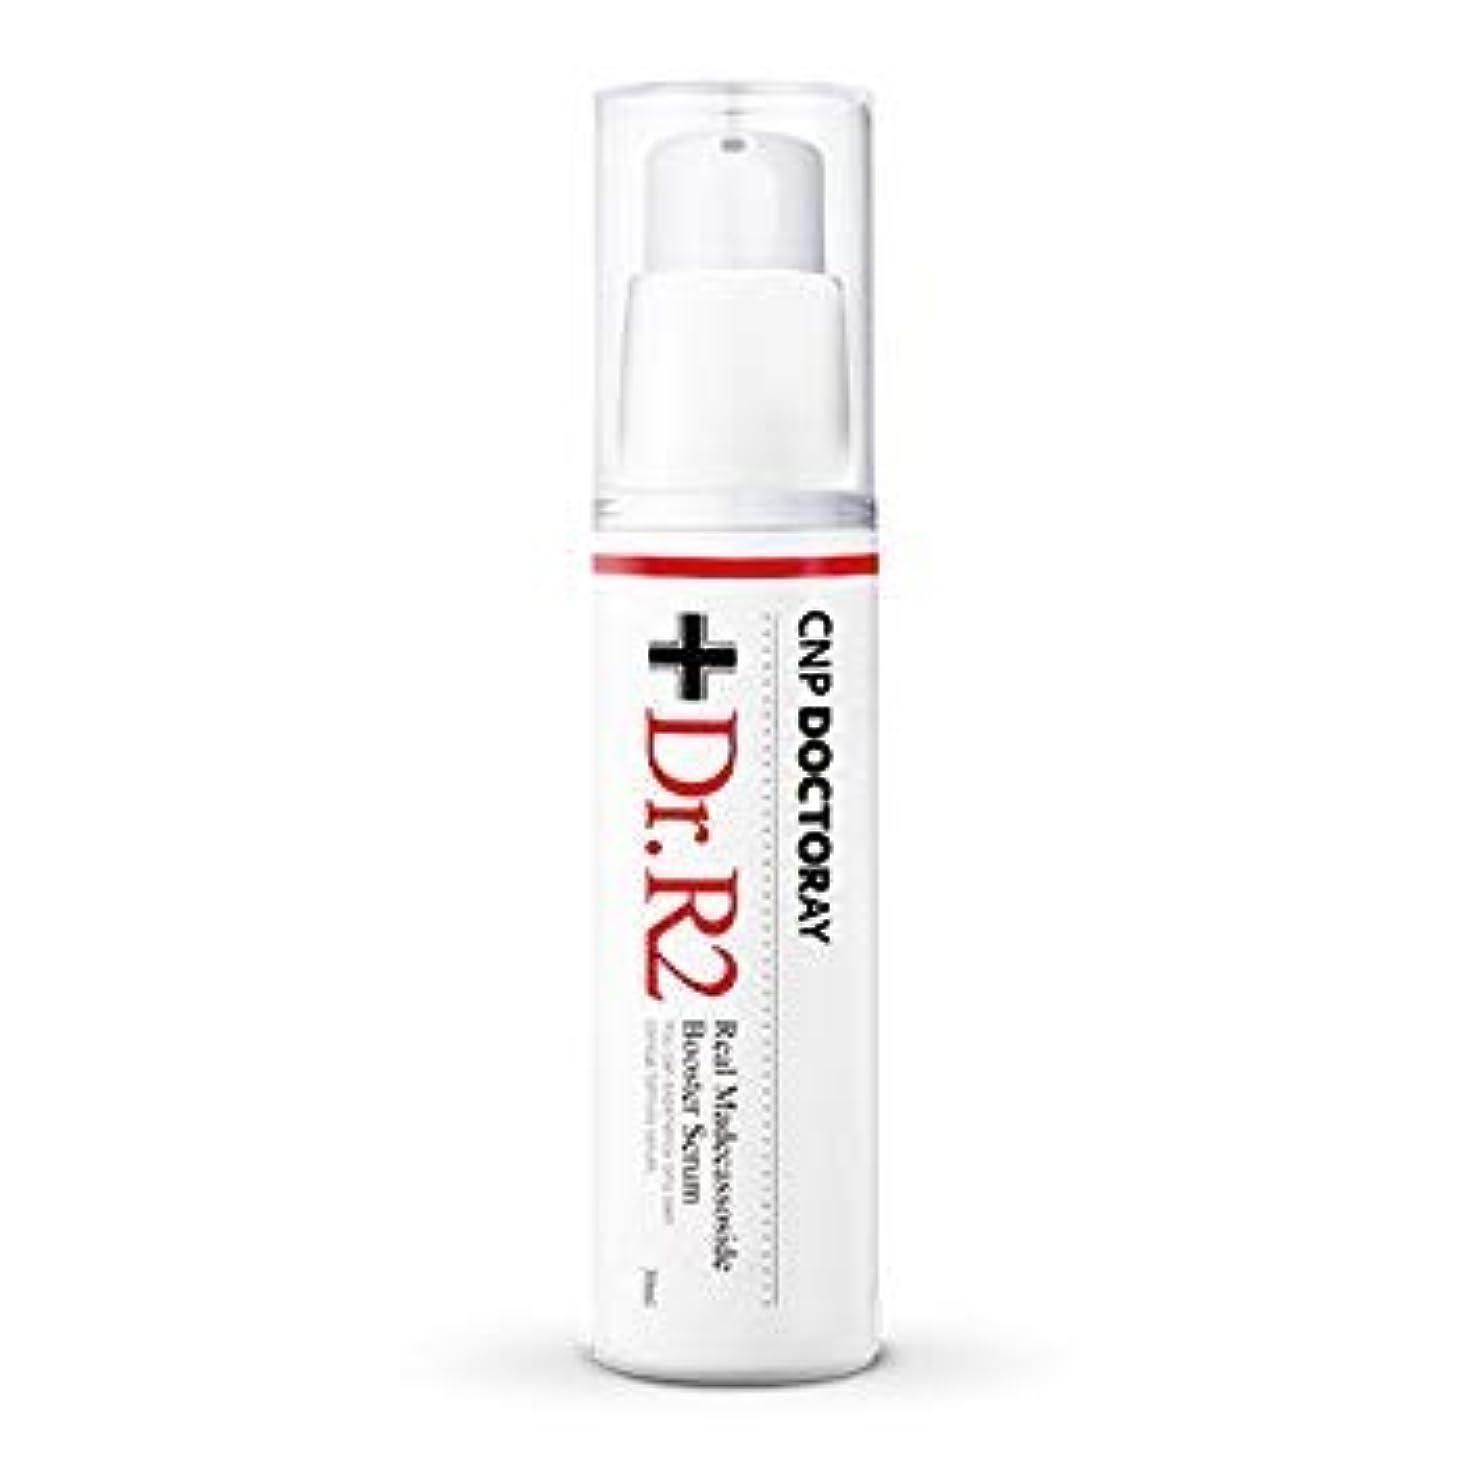 CNPドクターレイ(CNP DOCTORAY)Dr.R2 リアルマデカーソサイドブースターセラム 30ml (Dr.R2 Real Madecassoside Booster Serum)